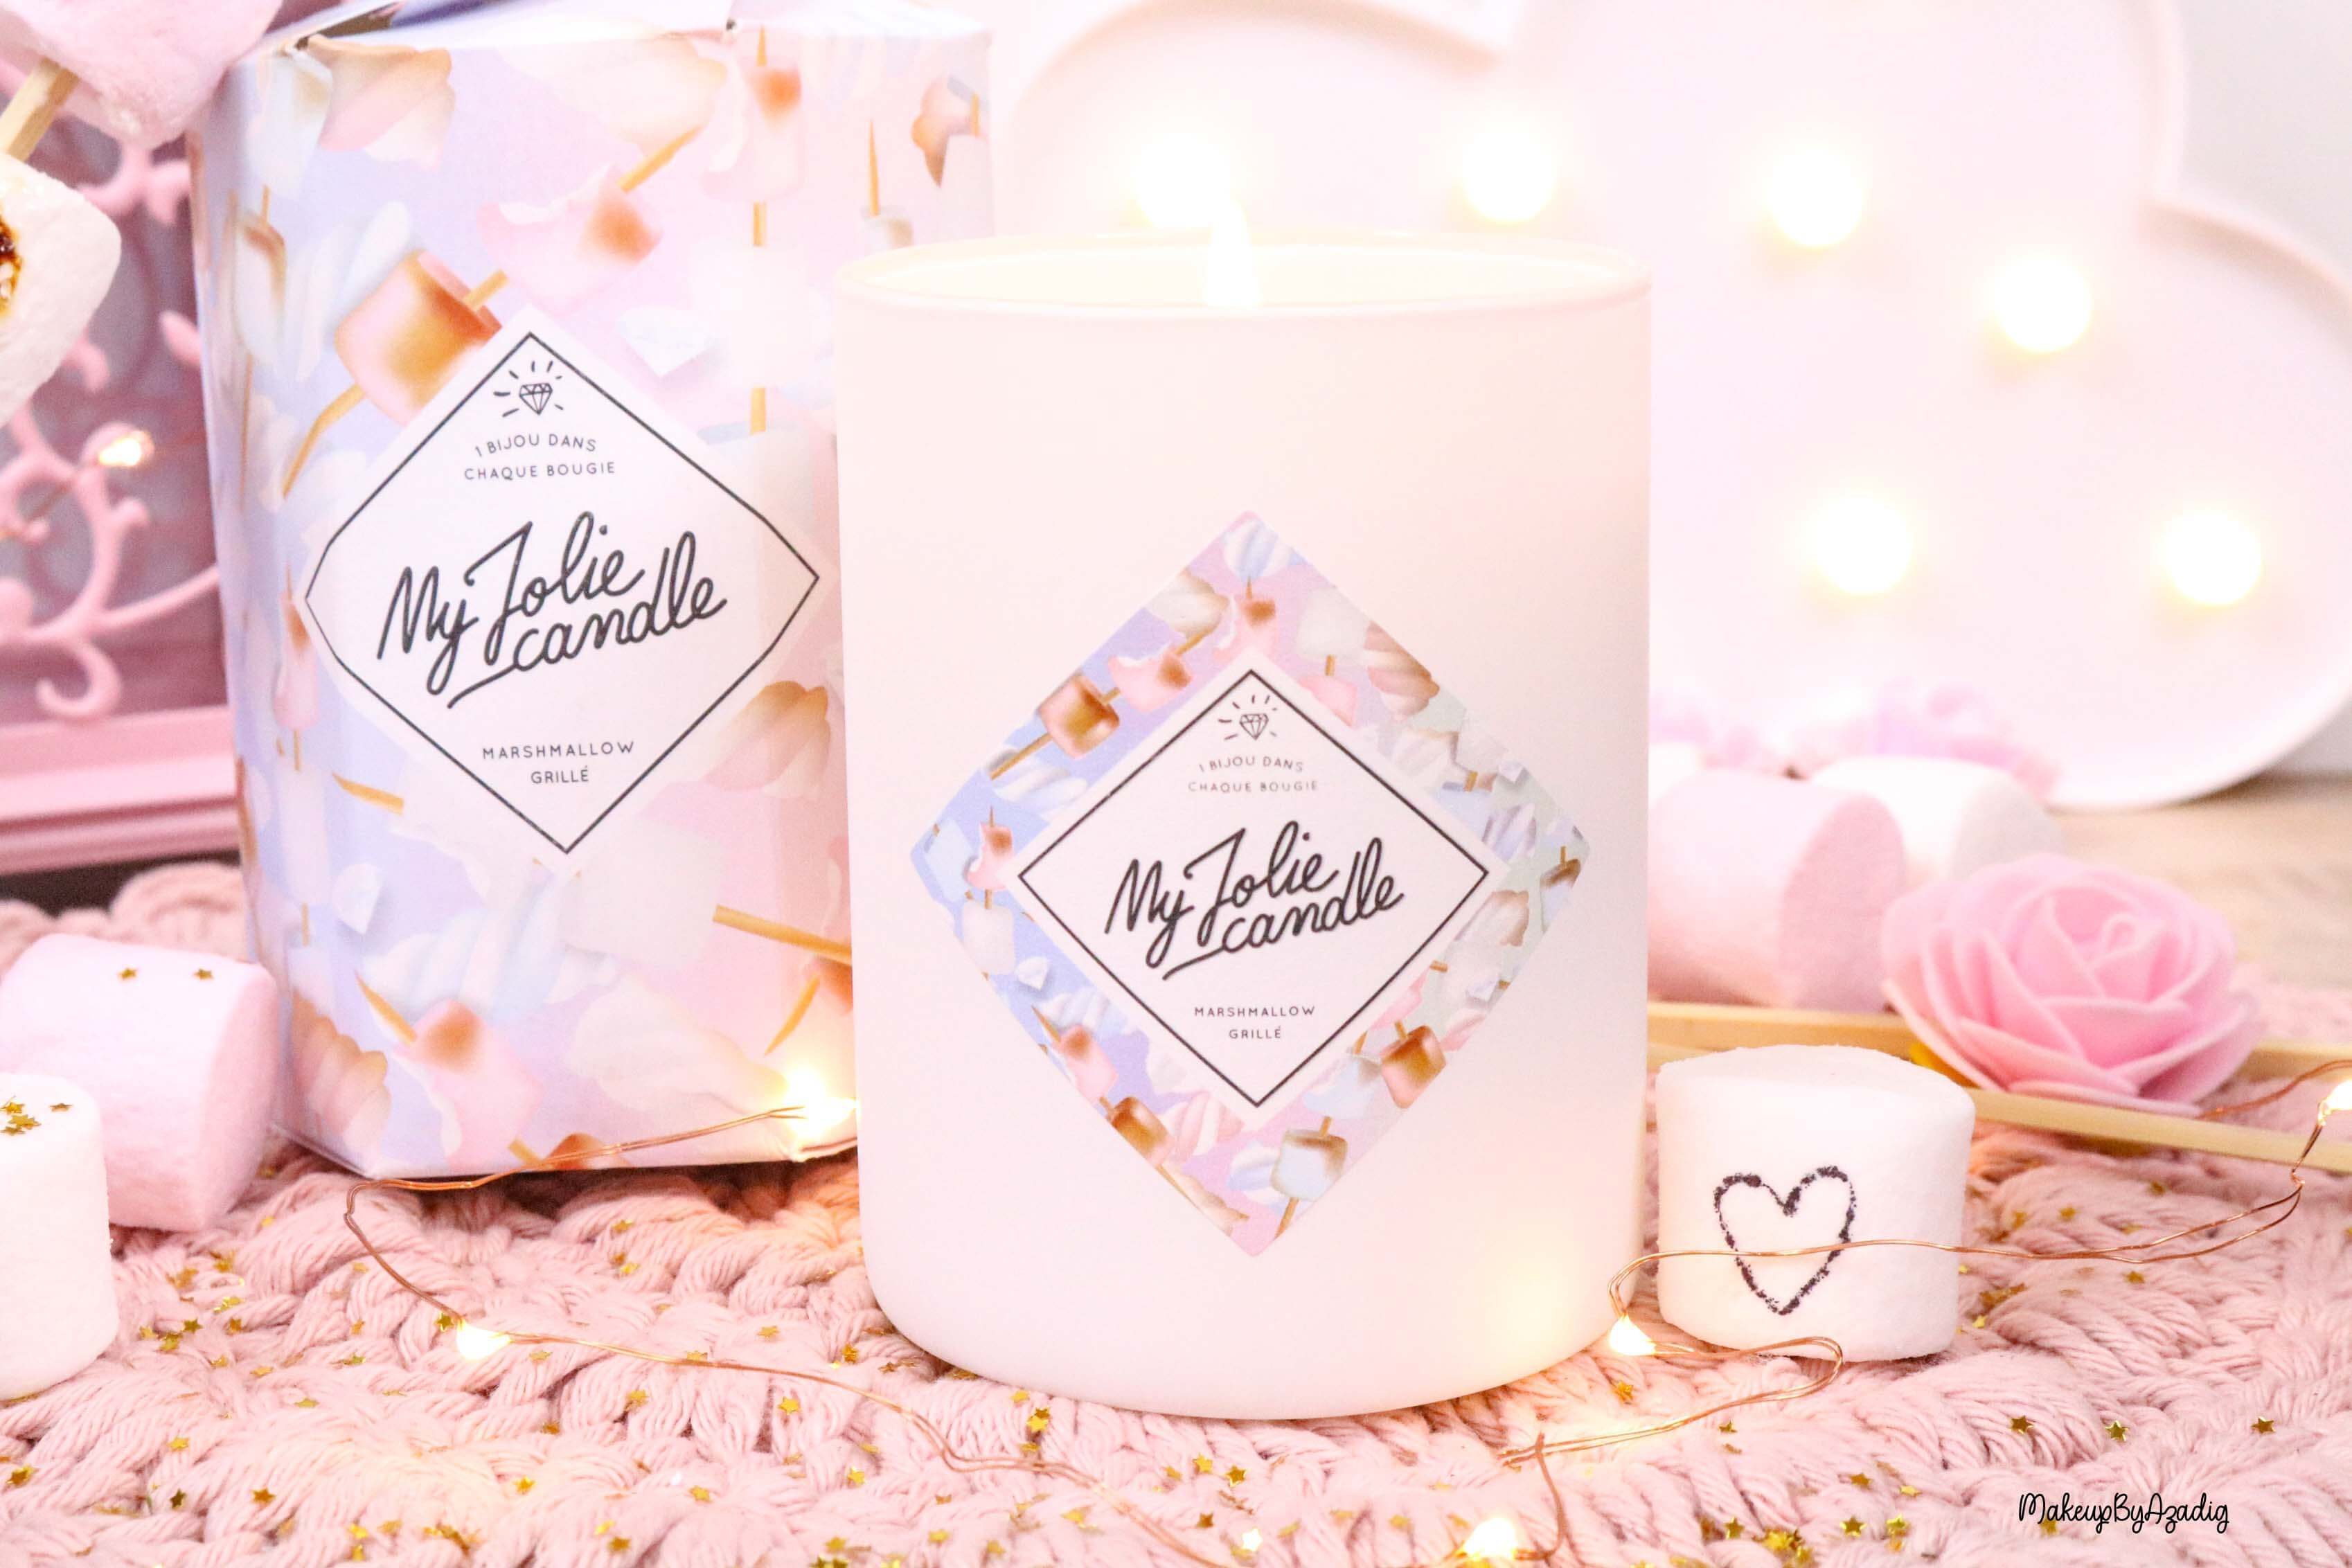 my-jolie-candle-bougie-bijou-swarovski-argent-cadeau-maman-mamie-femme-makeupbyazadig-collector-chamallow-avis-prix-senteur